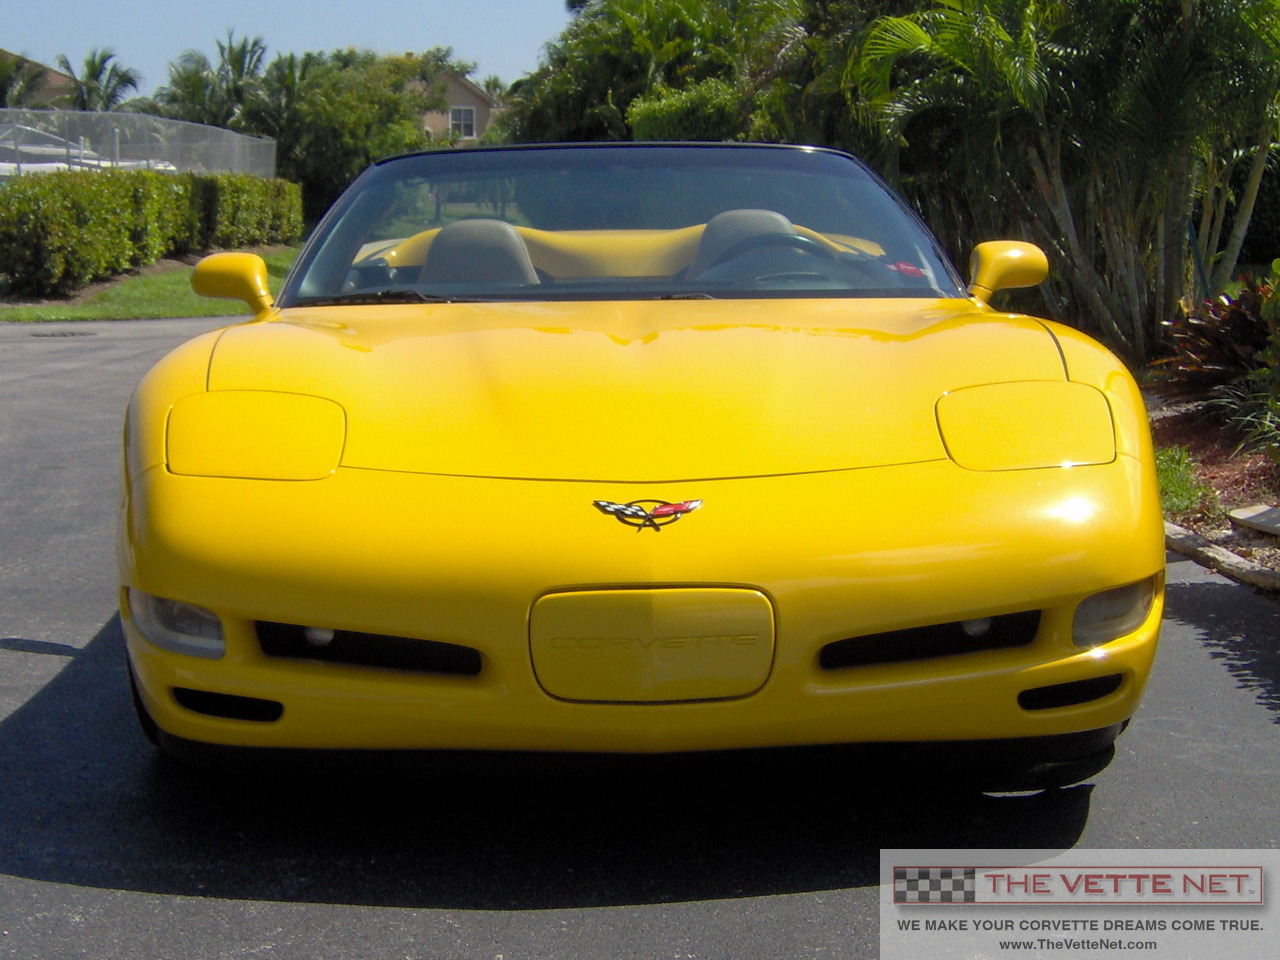 2004 millennium yellow convertible corvette corvette news. Black Bedroom Furniture Sets. Home Design Ideas